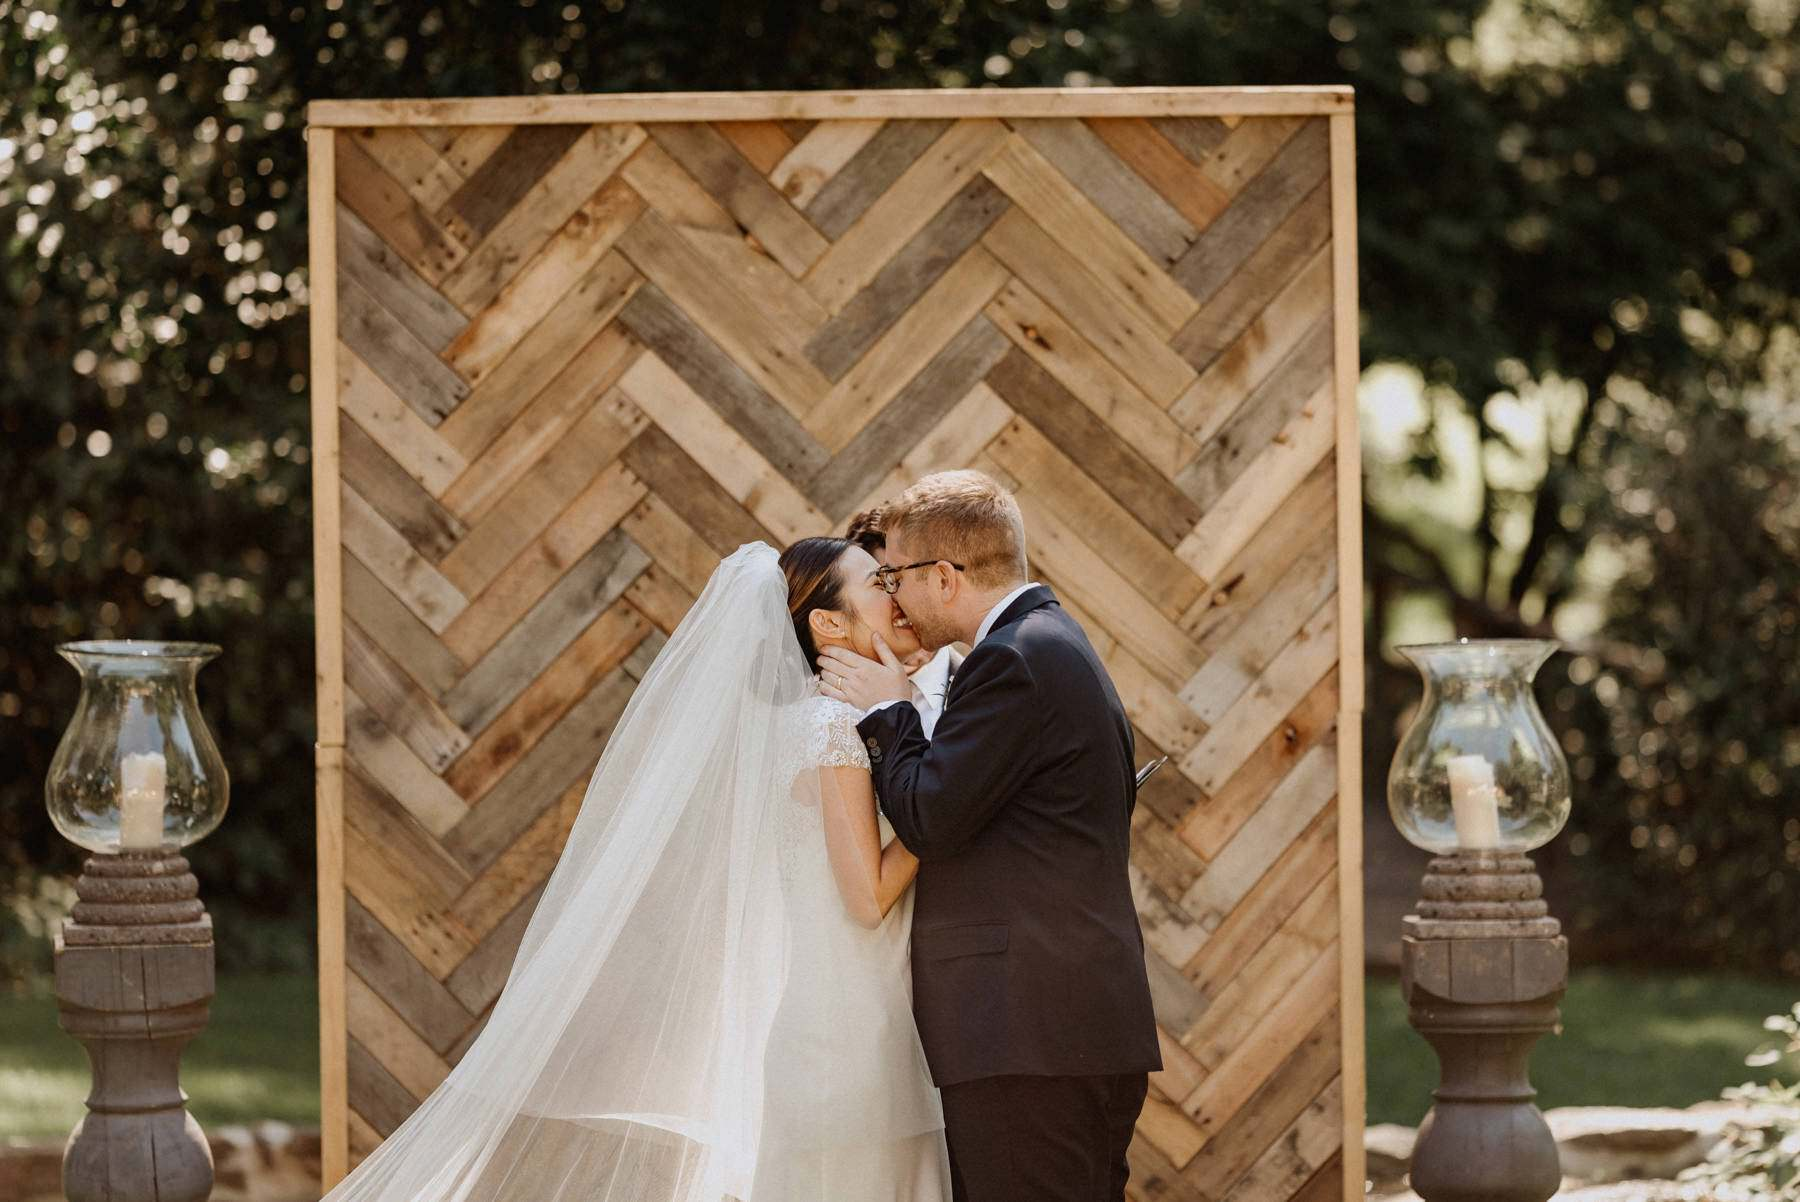 Appleford-estate-wedding-91.jpg